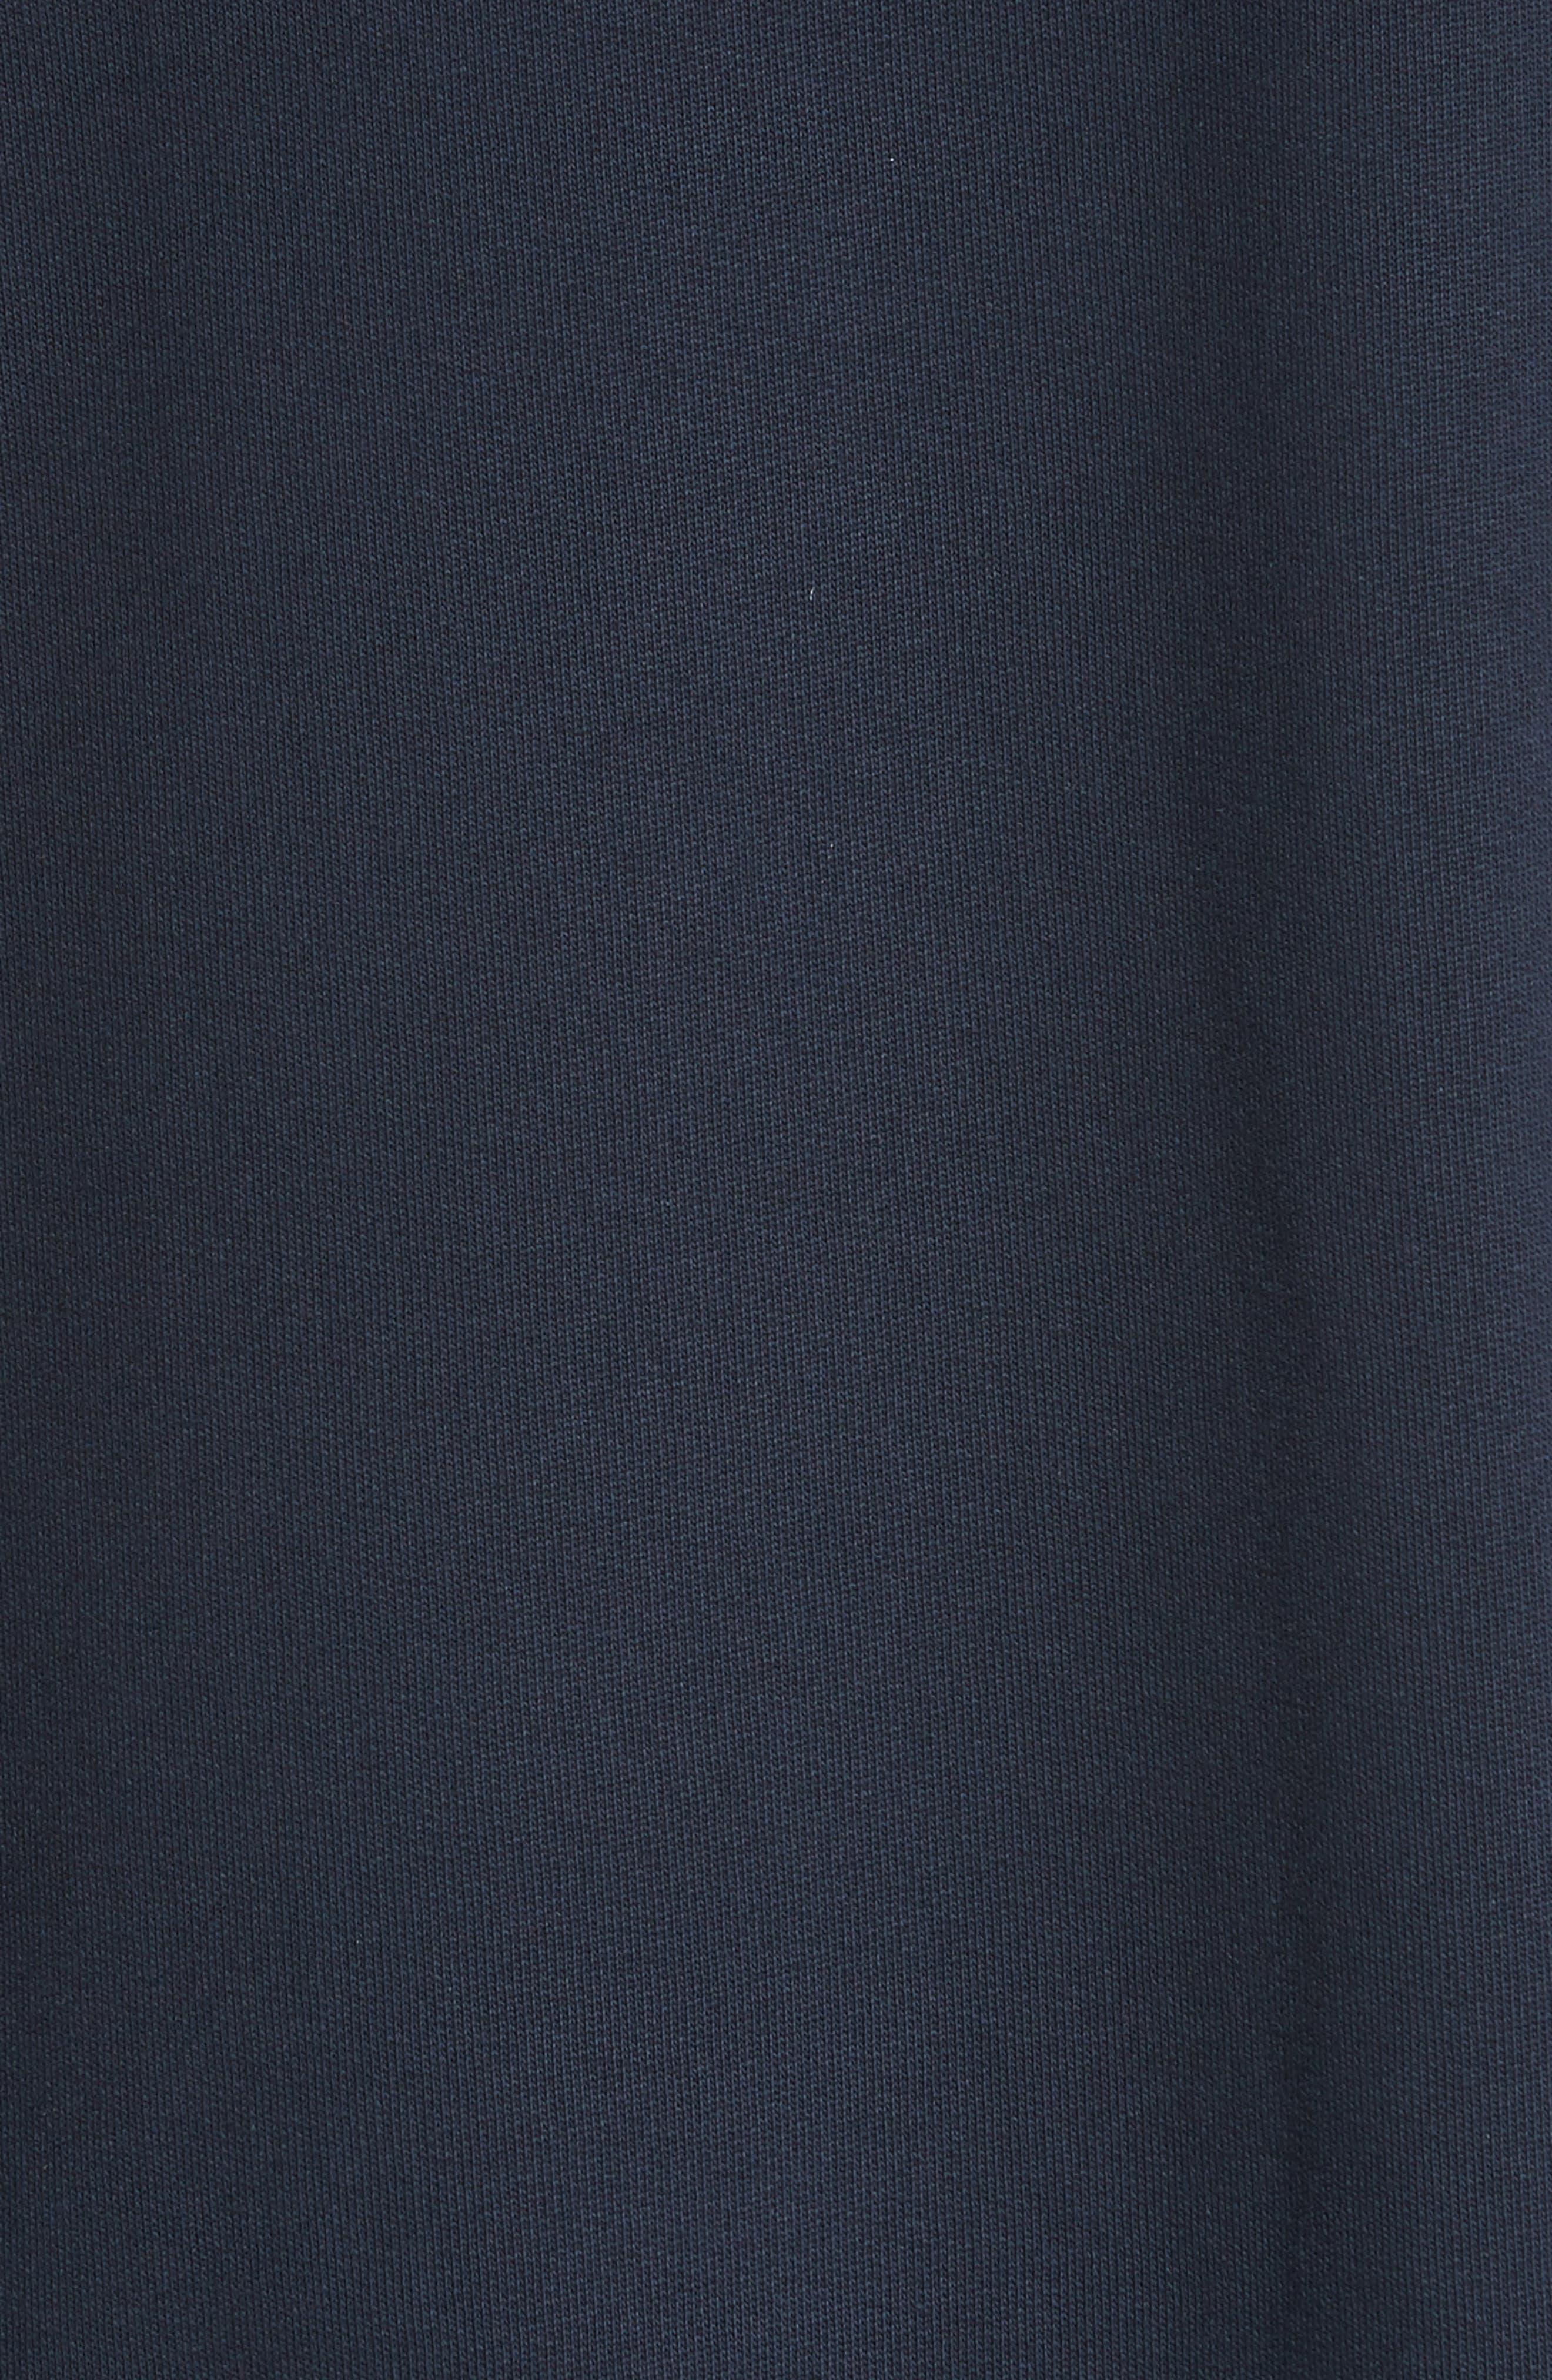 Sweatshirt Dress,                             Alternate thumbnail 5, color,                             410